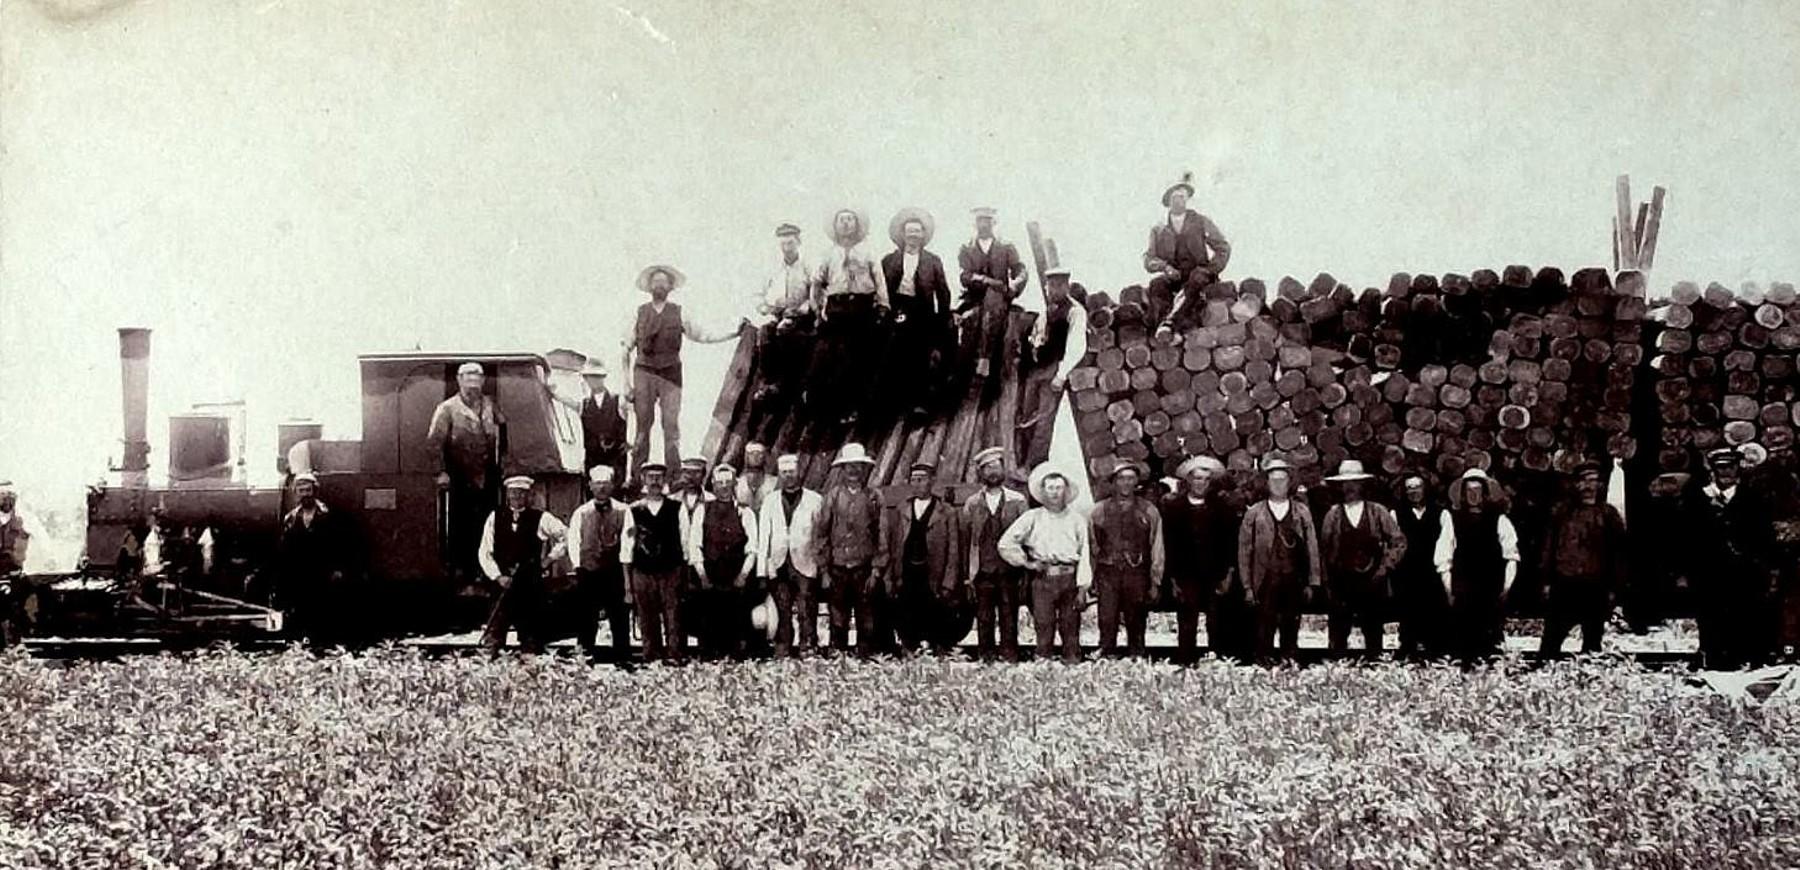 1899 franskmanden fotograf Zoltau Sivertsen